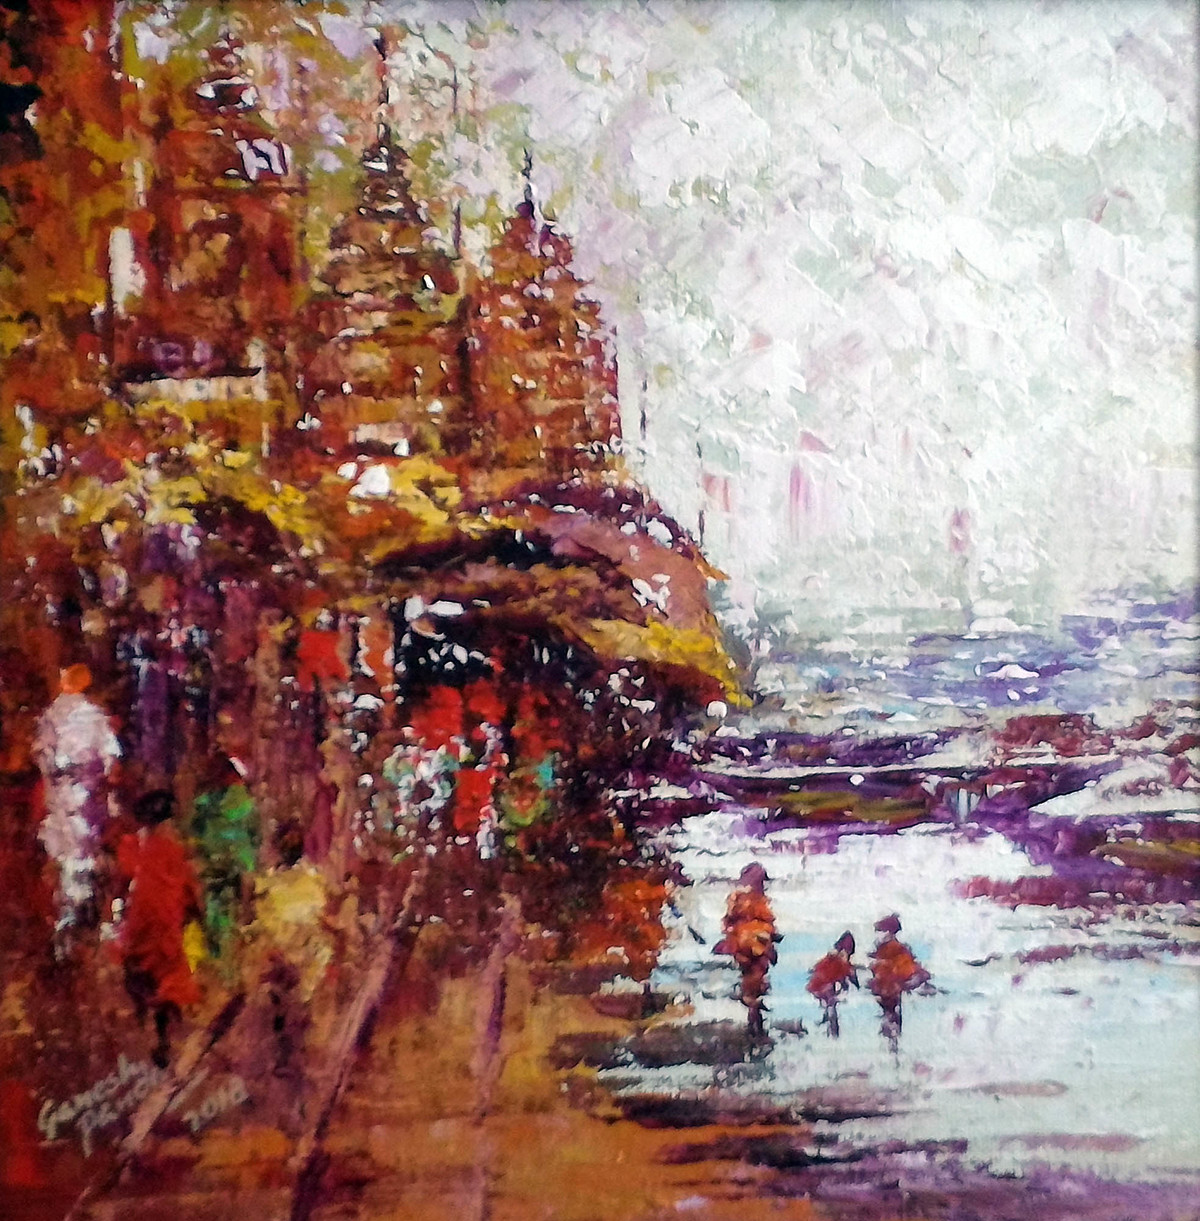 varanashi 2 by Ganesh Panda, Expressionism Painting, Acrylic on Canvas, Brown color